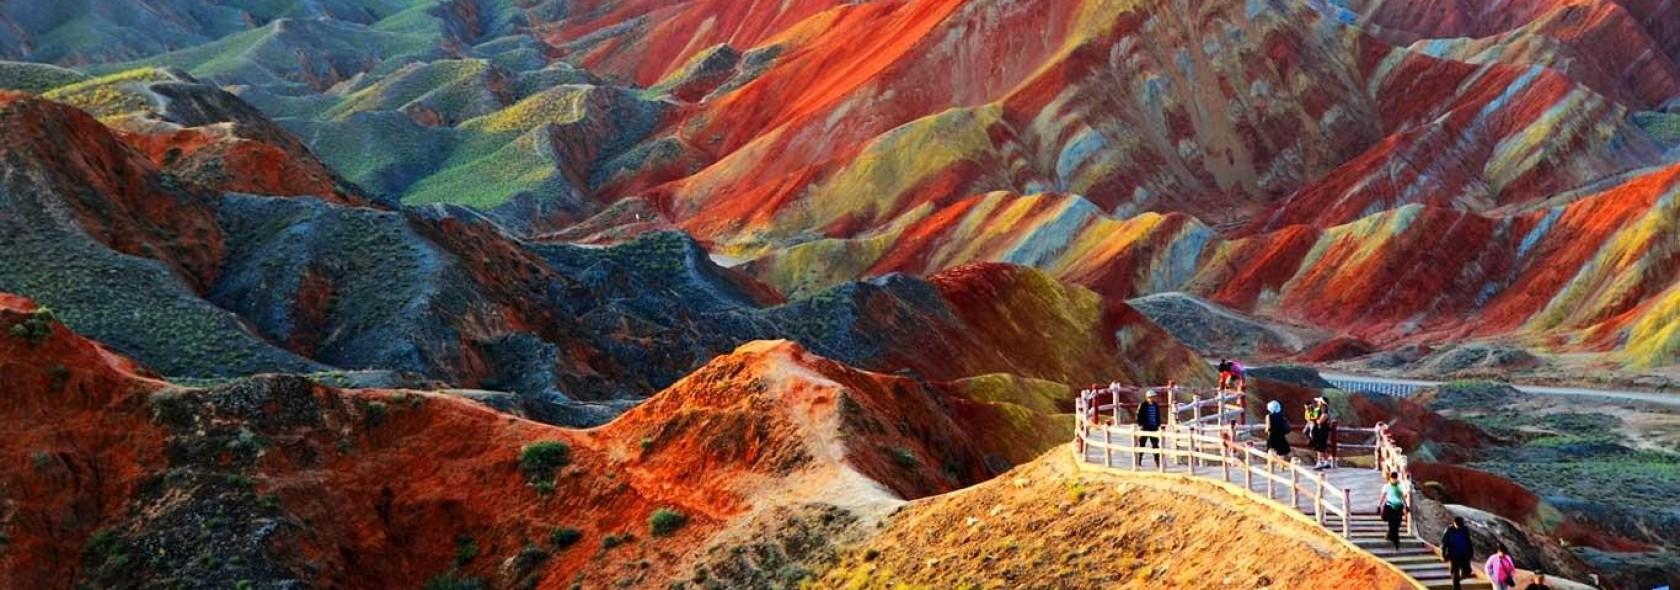 Montagne Arcobaleno - Cina